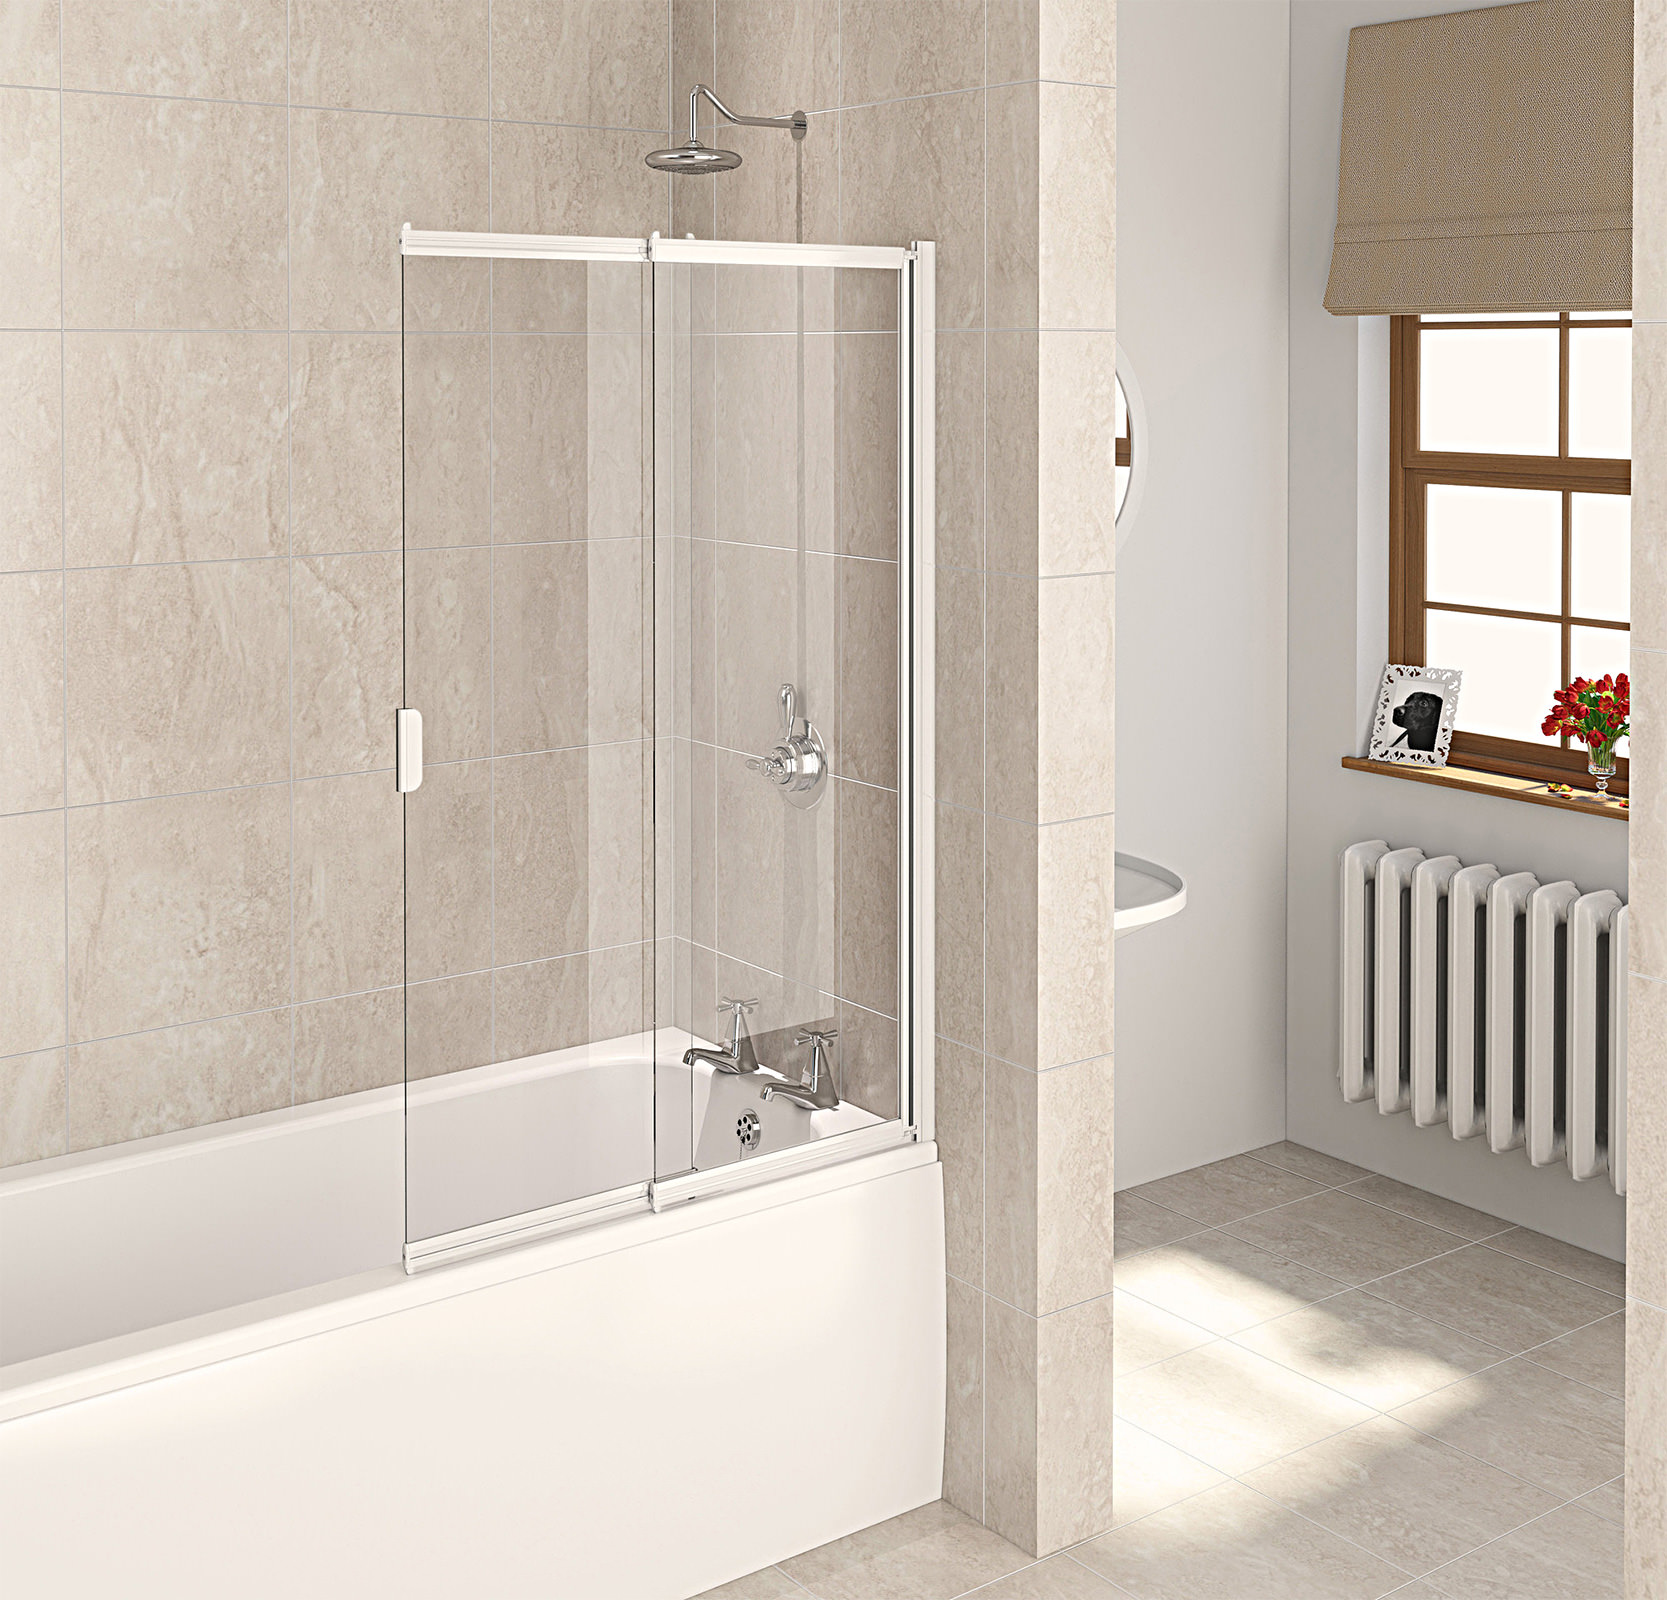 Aqualux Aqua 4 White 2 Panel Slider Bath Screen 820mm